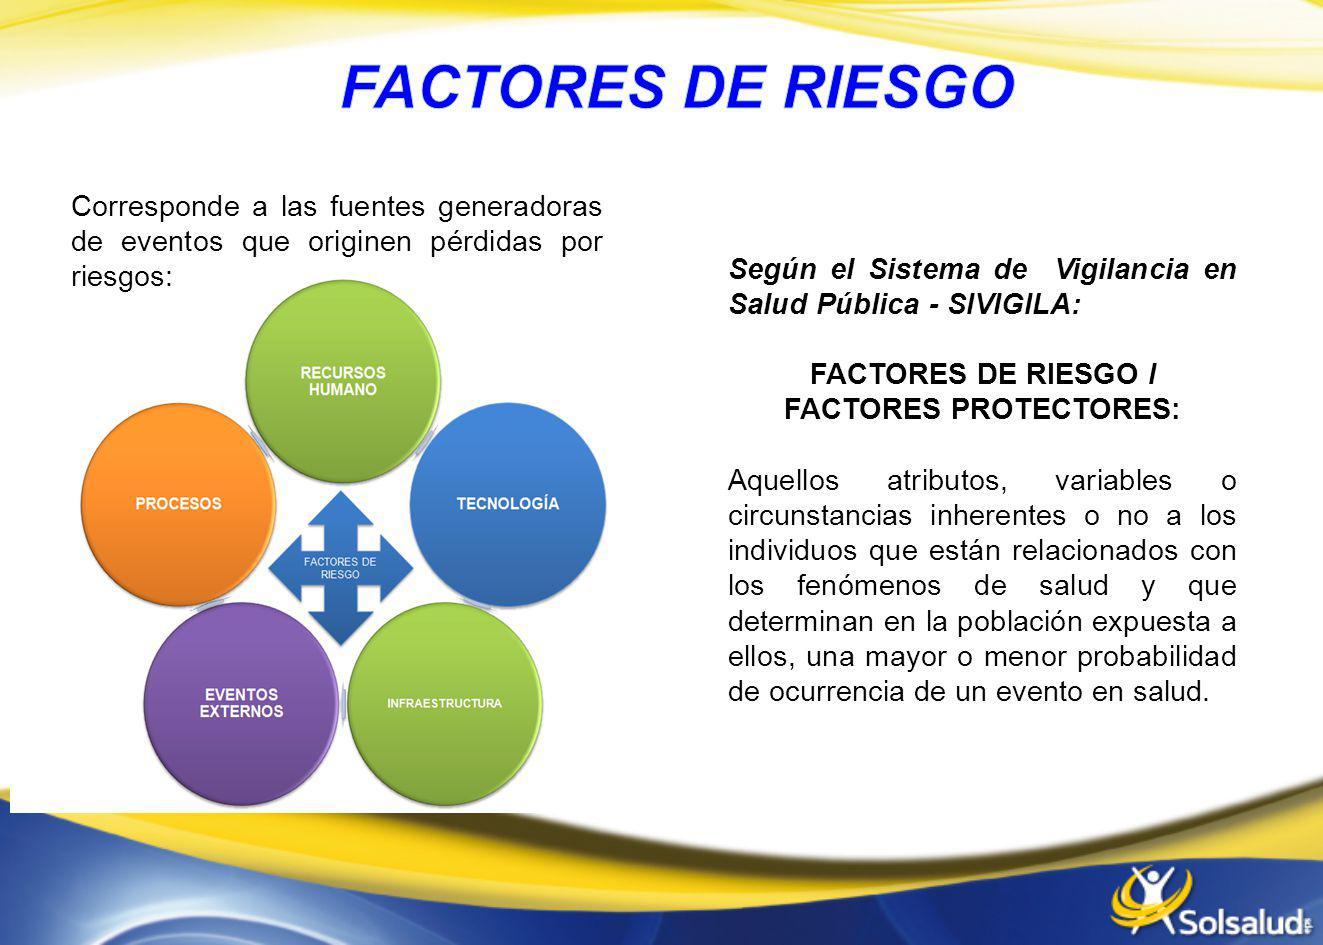 FACTORES DE RIESGO I FACTORES PROTECTORES: